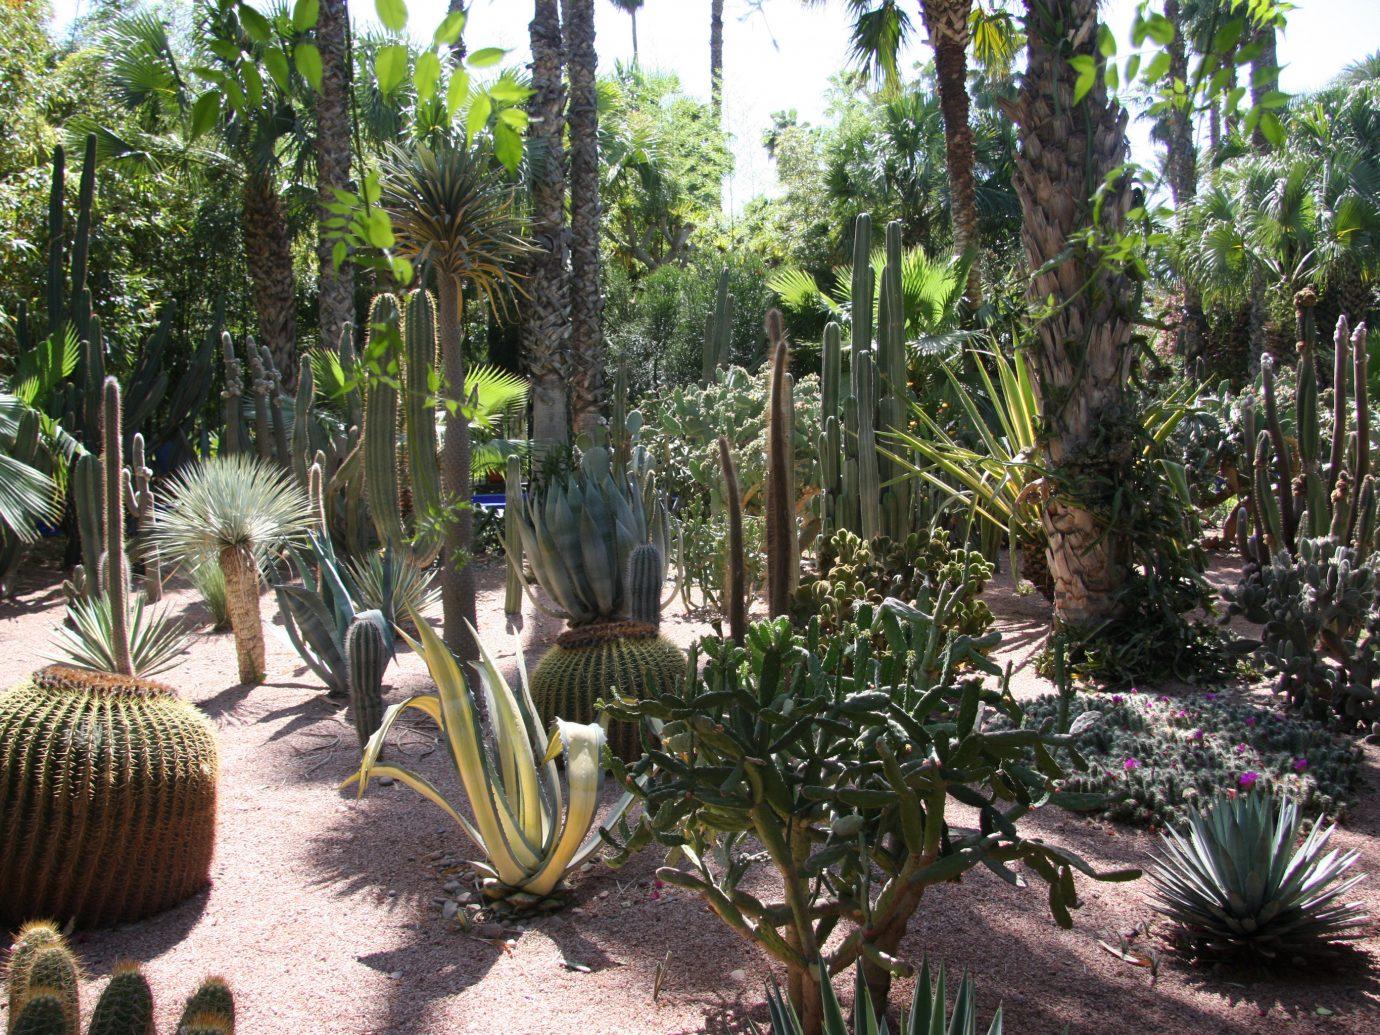 Trip Ideas tree cactus plant vegetation botanical garden outdoor arecales flowering plant flora palm tree biome Garden hedgehog cactus tropics flower recreation